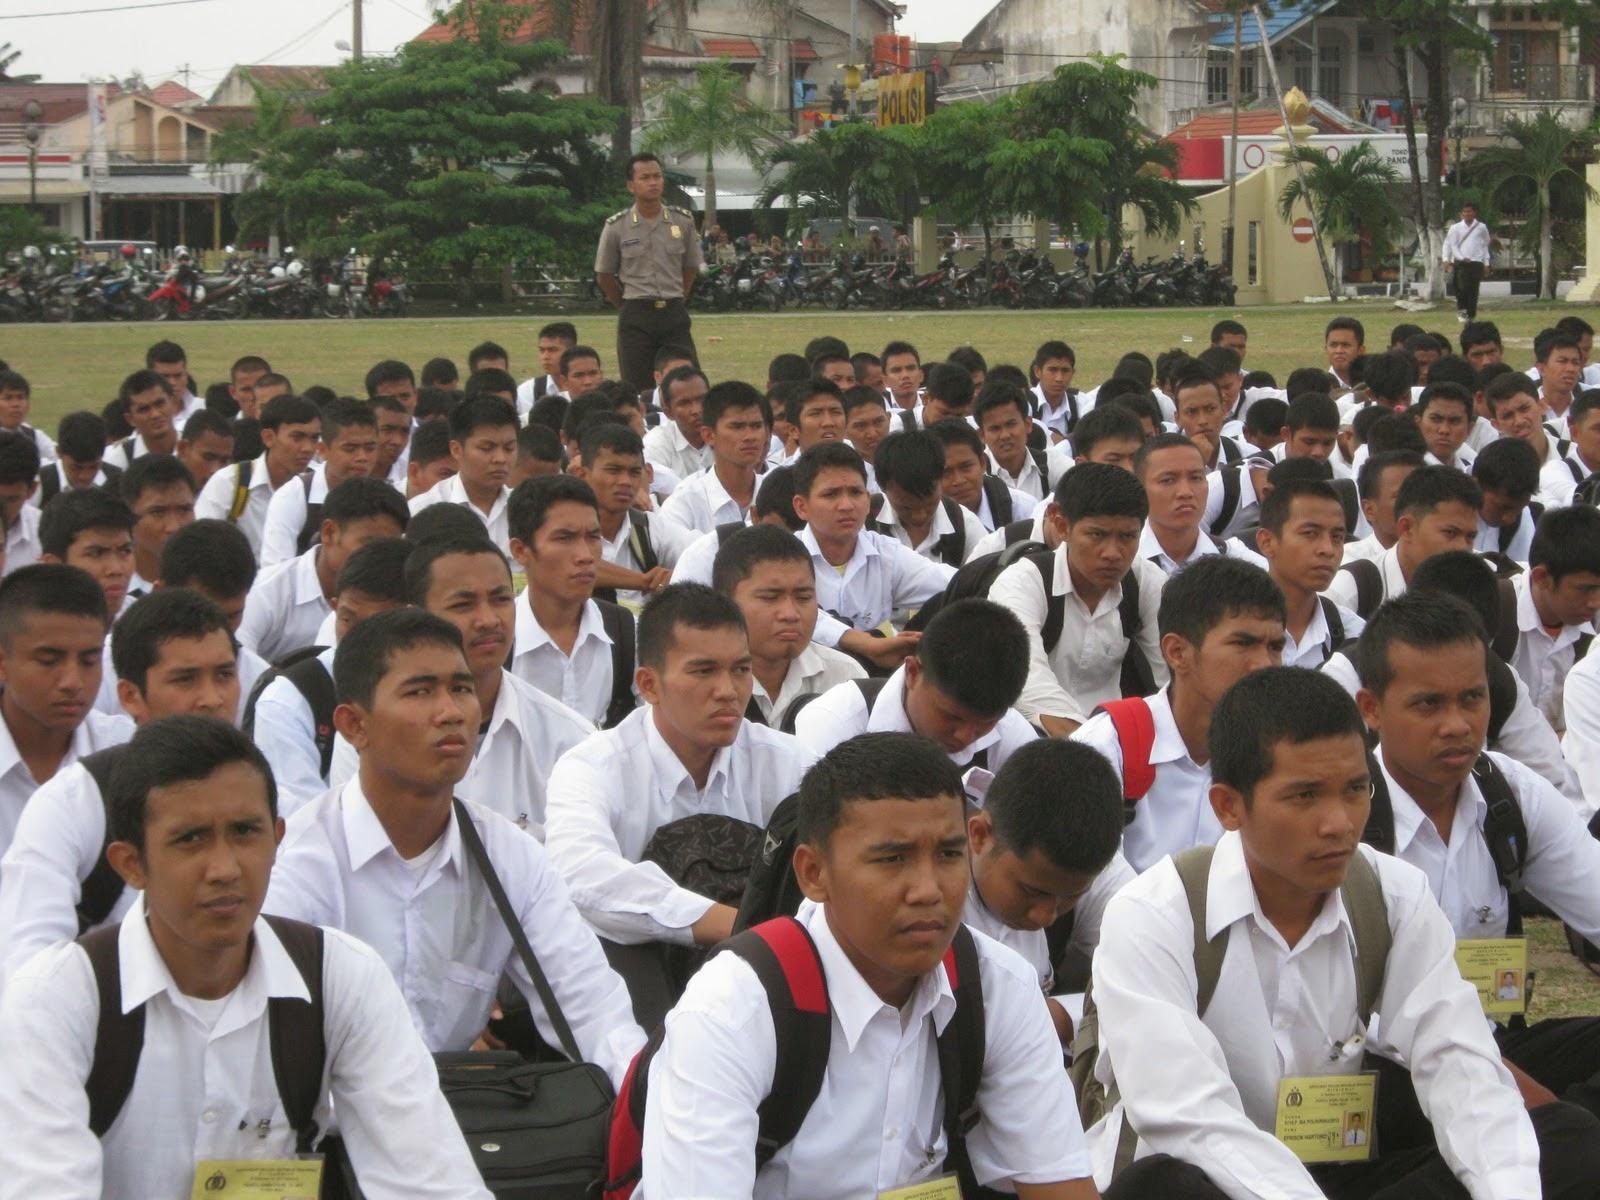 Pengumuman Hasil Tes Rikpsi/Pemeriksaan Psikologi Polri 2014